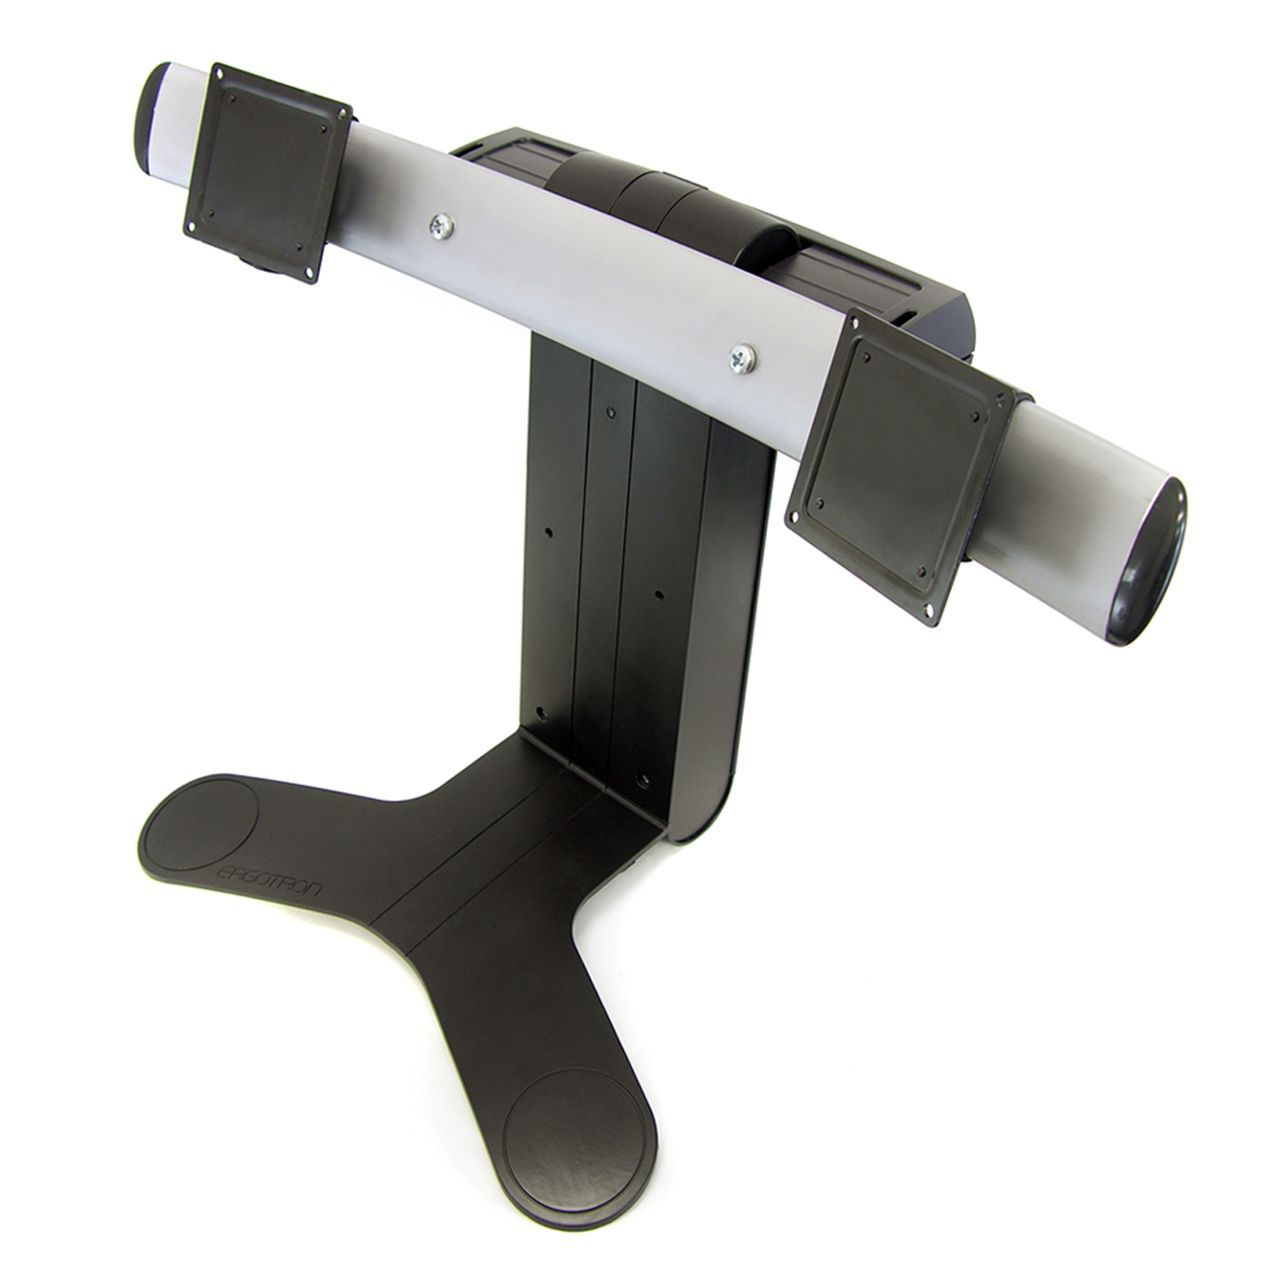 dual lcd stand flatscreenarm monitorsteun ERKALCD202 Schuin